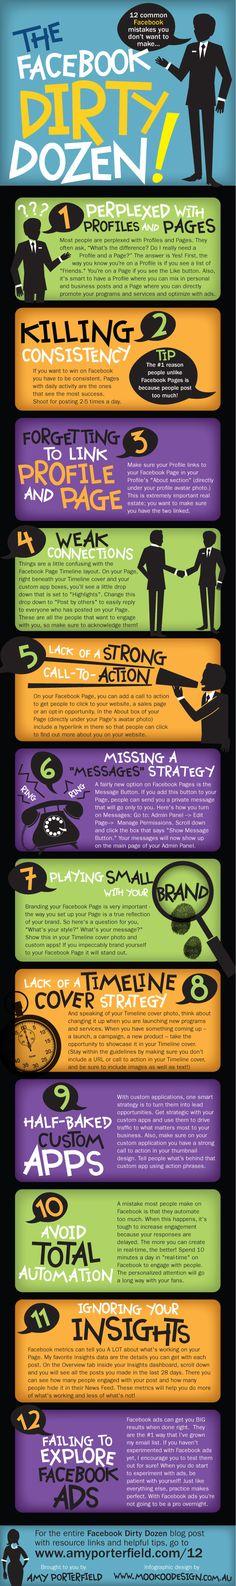 12 Facebook Mistakes to Avoid  http://www.amyporterfield.com/wp-content/uploads/2012/06/DirtyDozen_Infographic.jpg